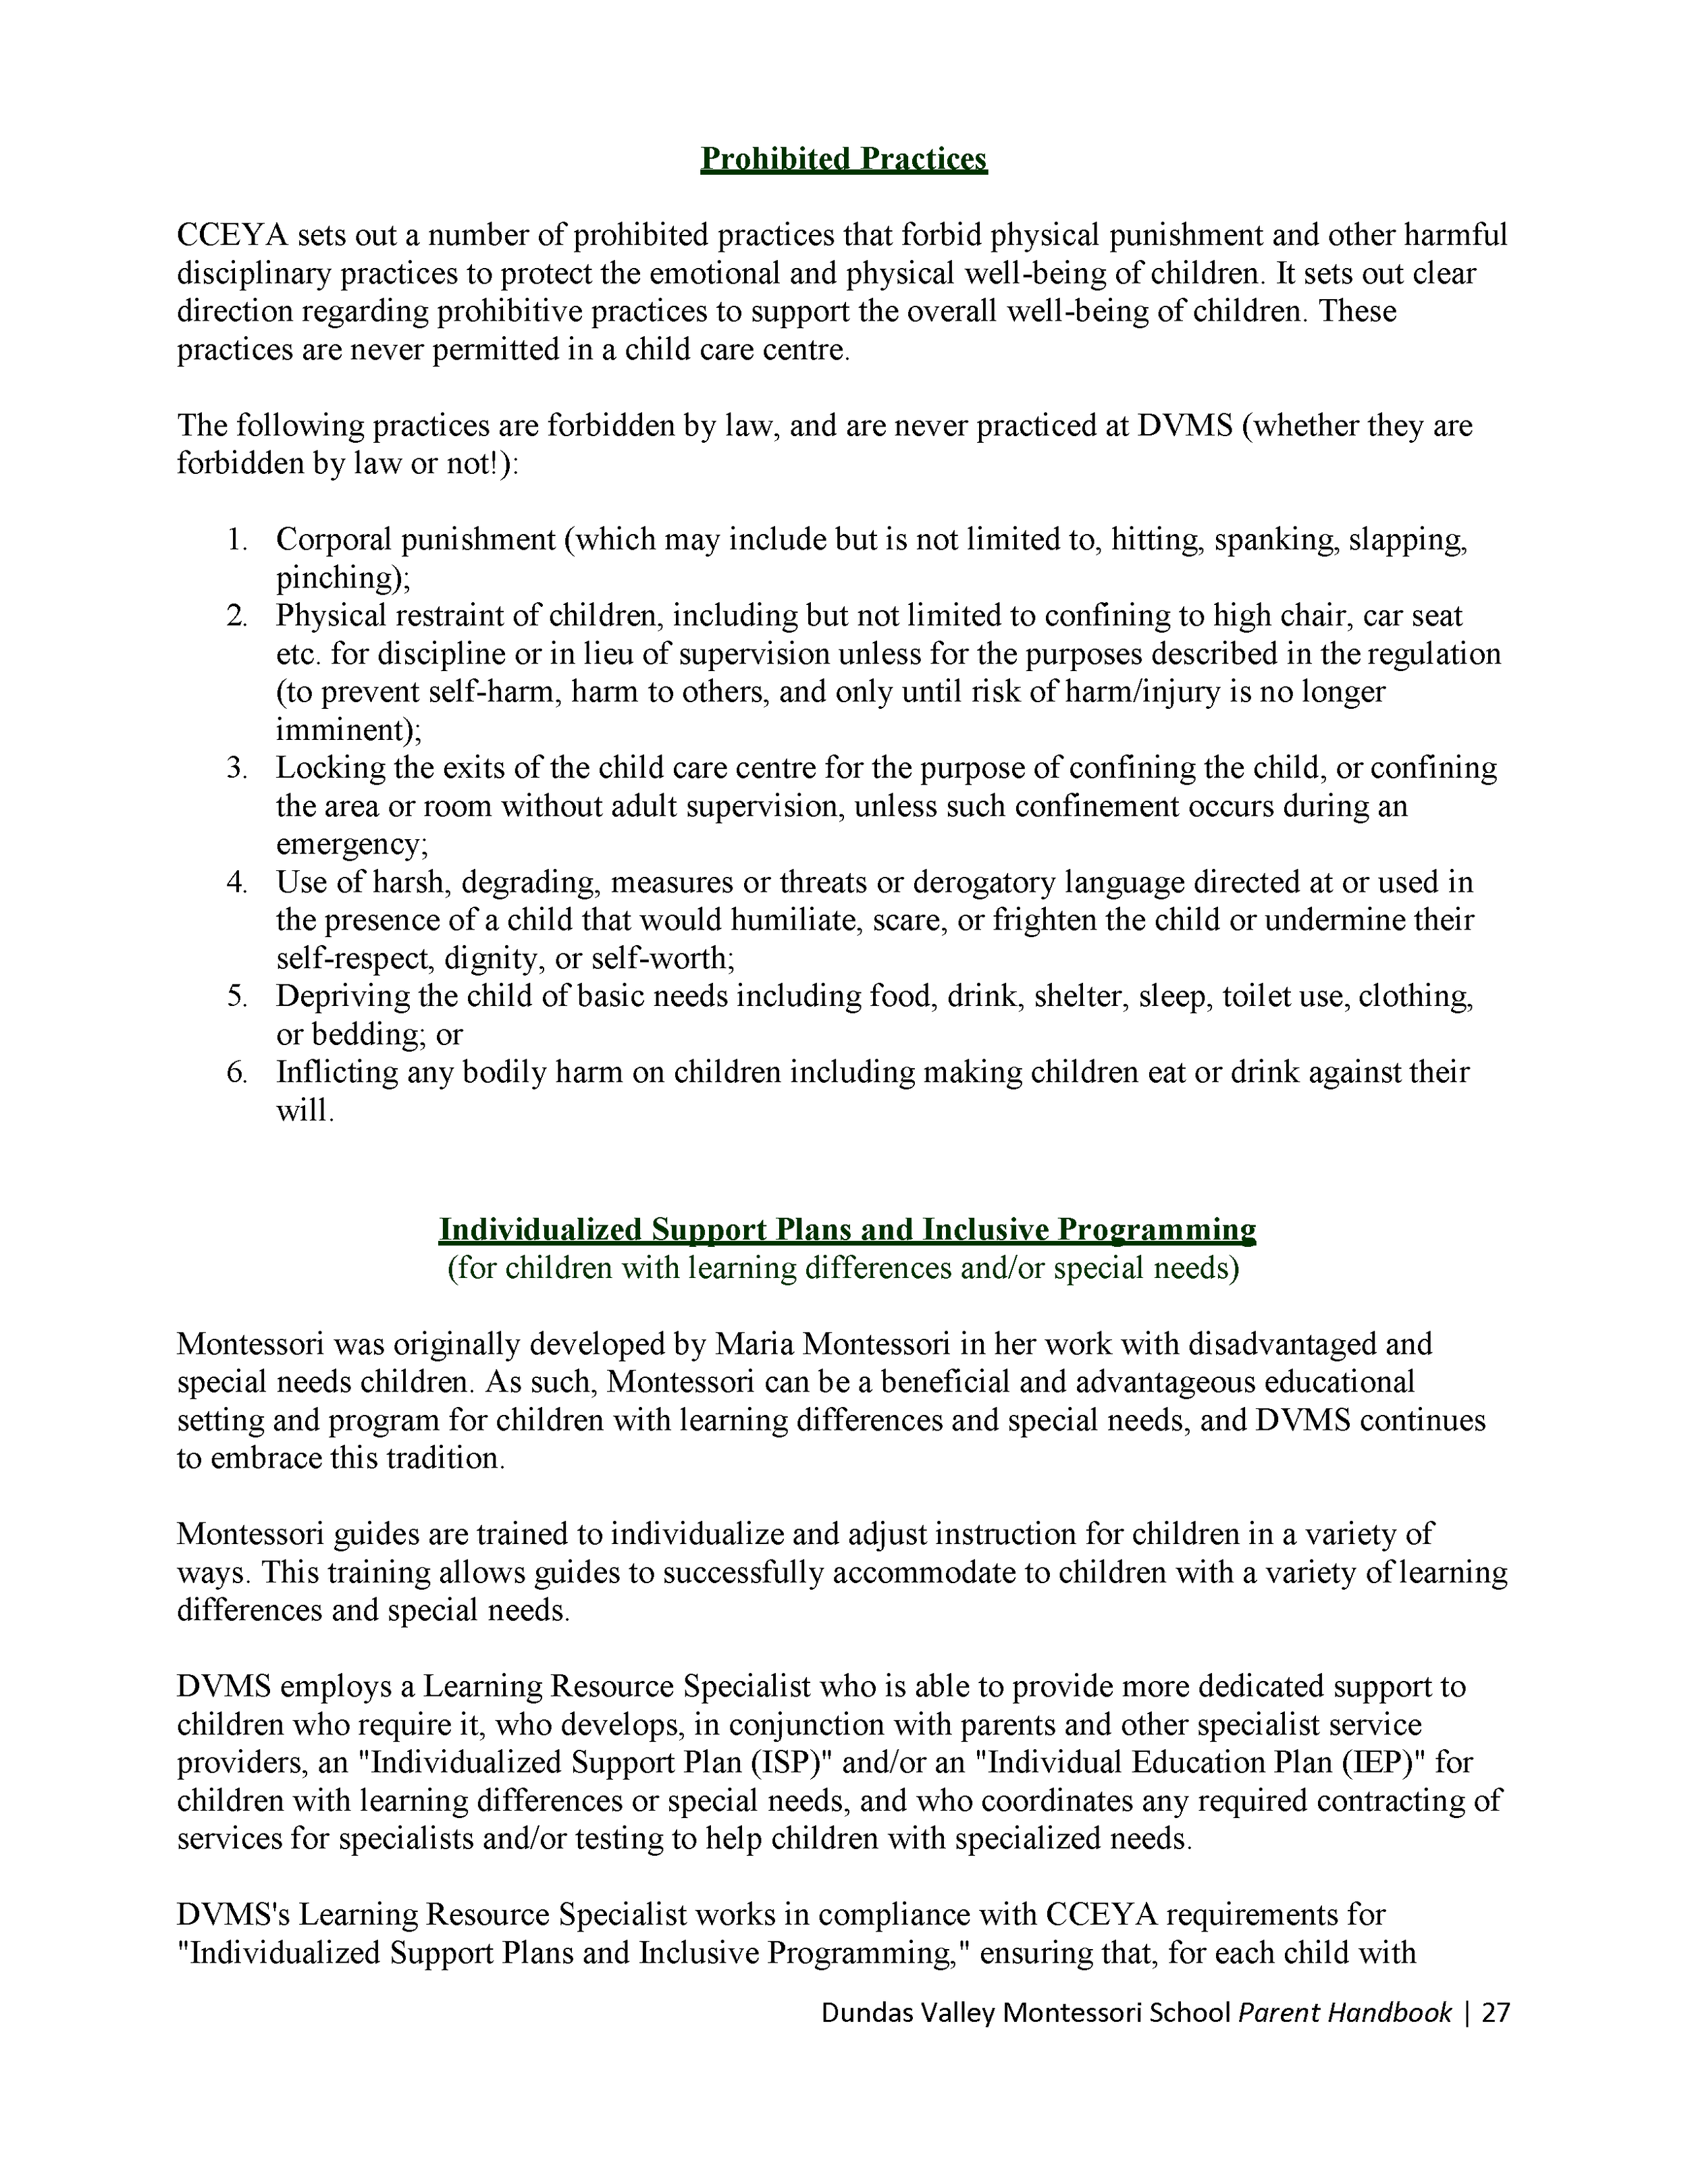 DVMS-Parent-Handbook-19-20_Page_029.png